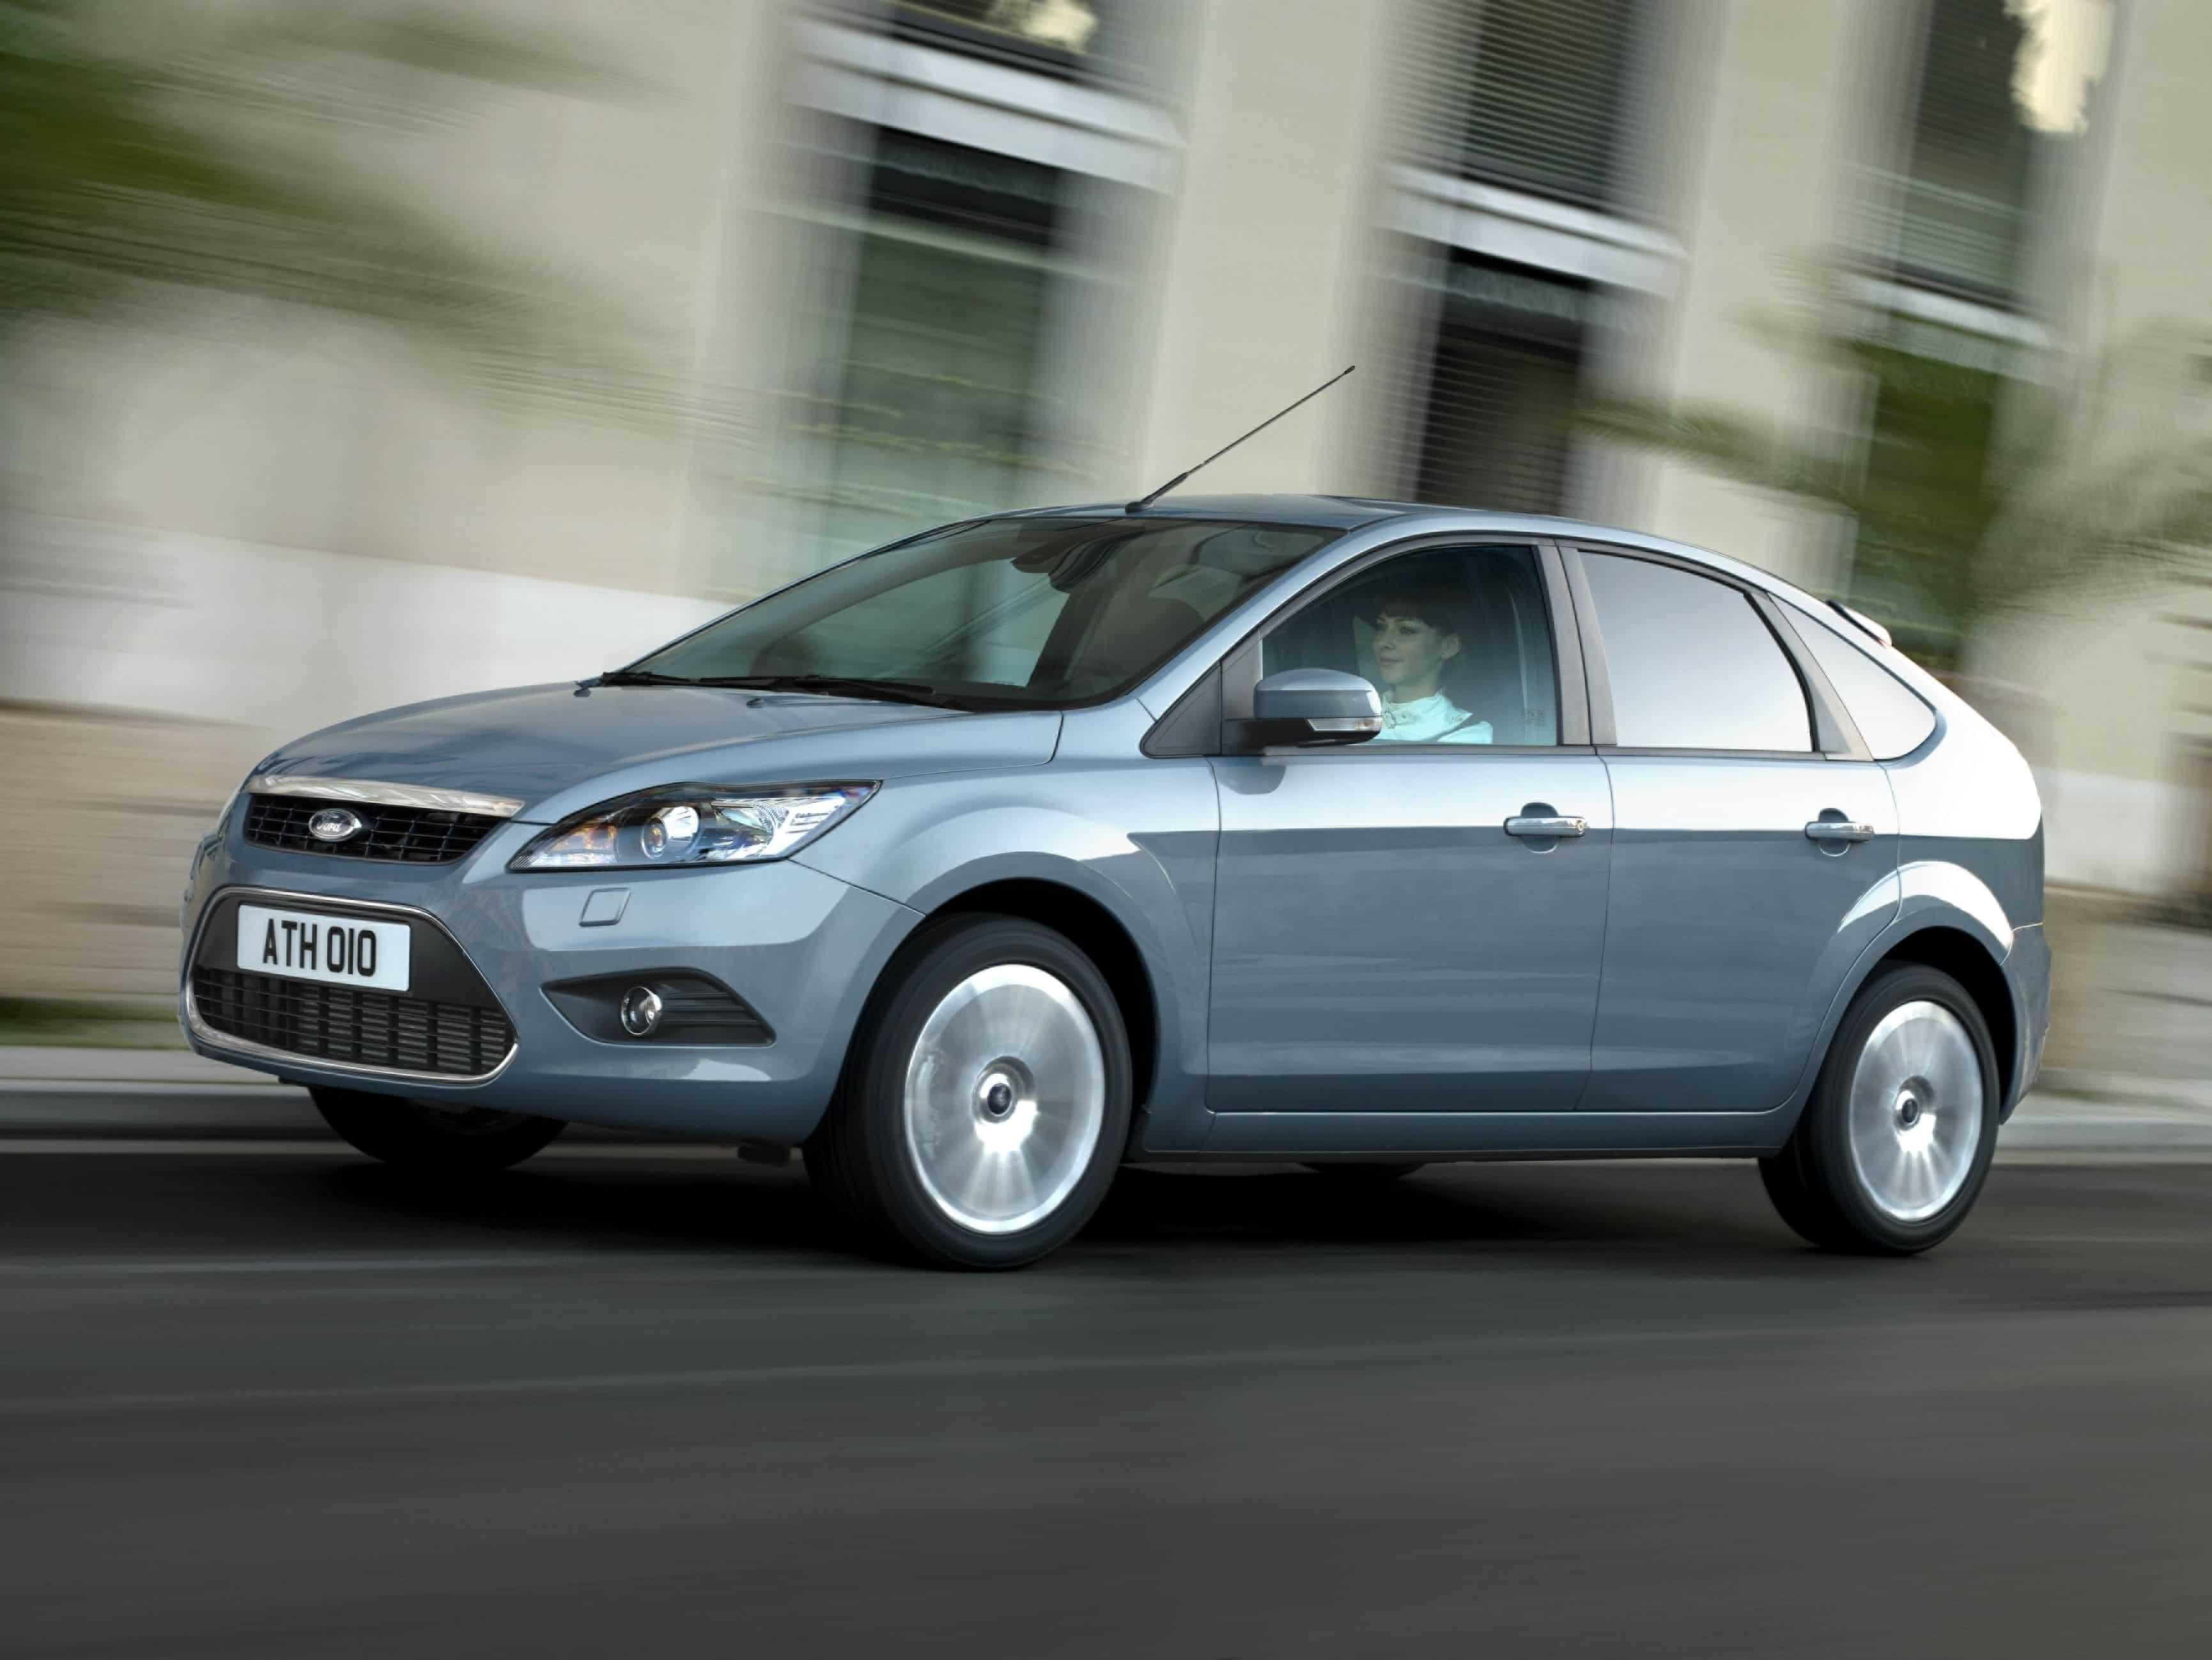 Ford Focus, Ford, Focus, hatchback, Ford Motor Company, car, family car, sensible car, bargain car, motoring, automotive, car, cars, vauxhall Astra, VW Golf, ebay, ebay motors, autotrader, not2grand